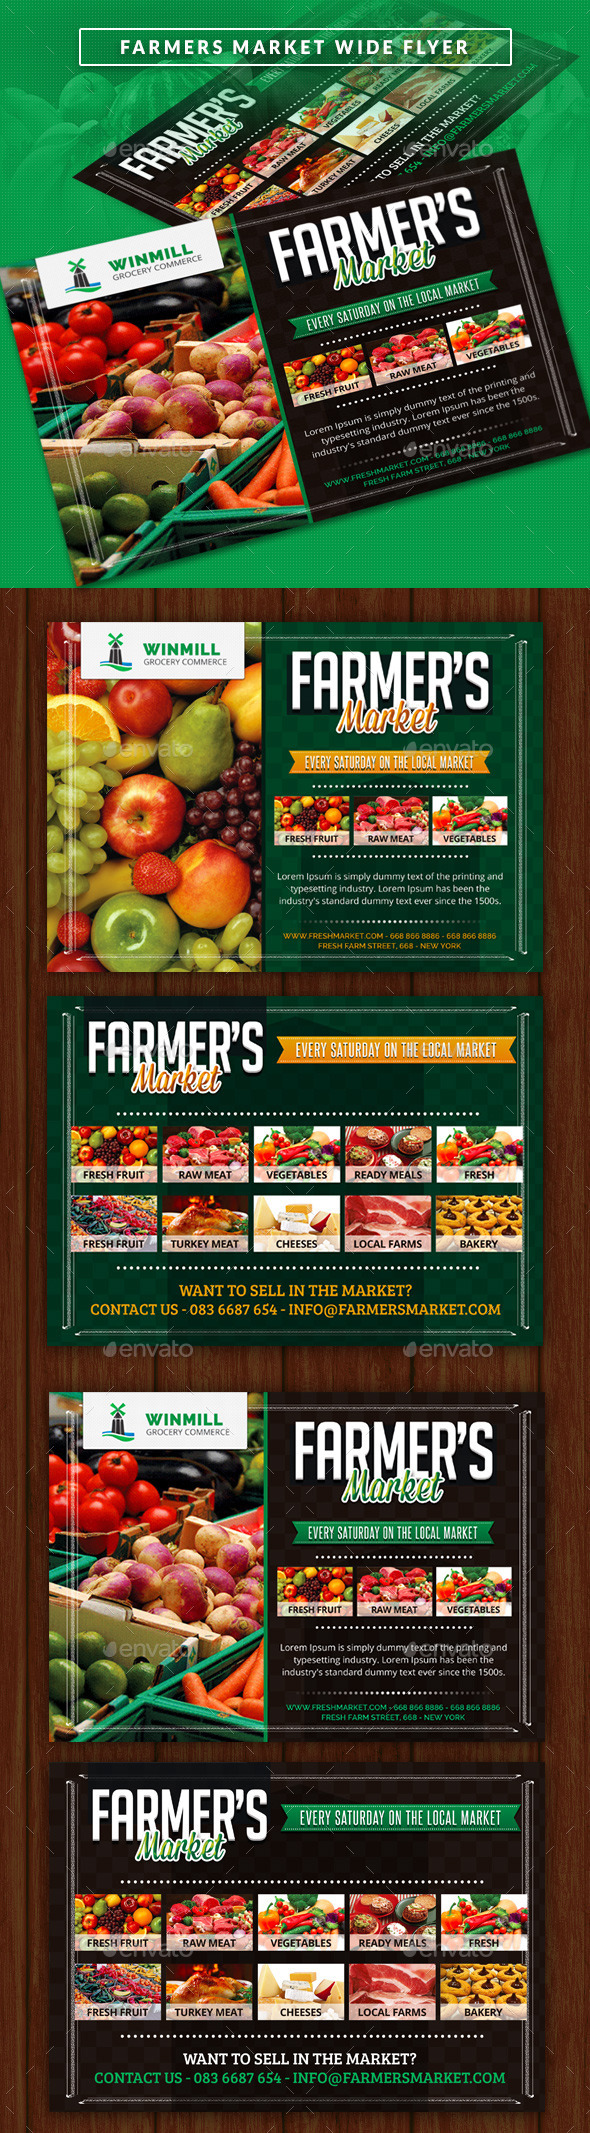 Farmer's Market Commerce Wide Flyer - Commerce Flyers